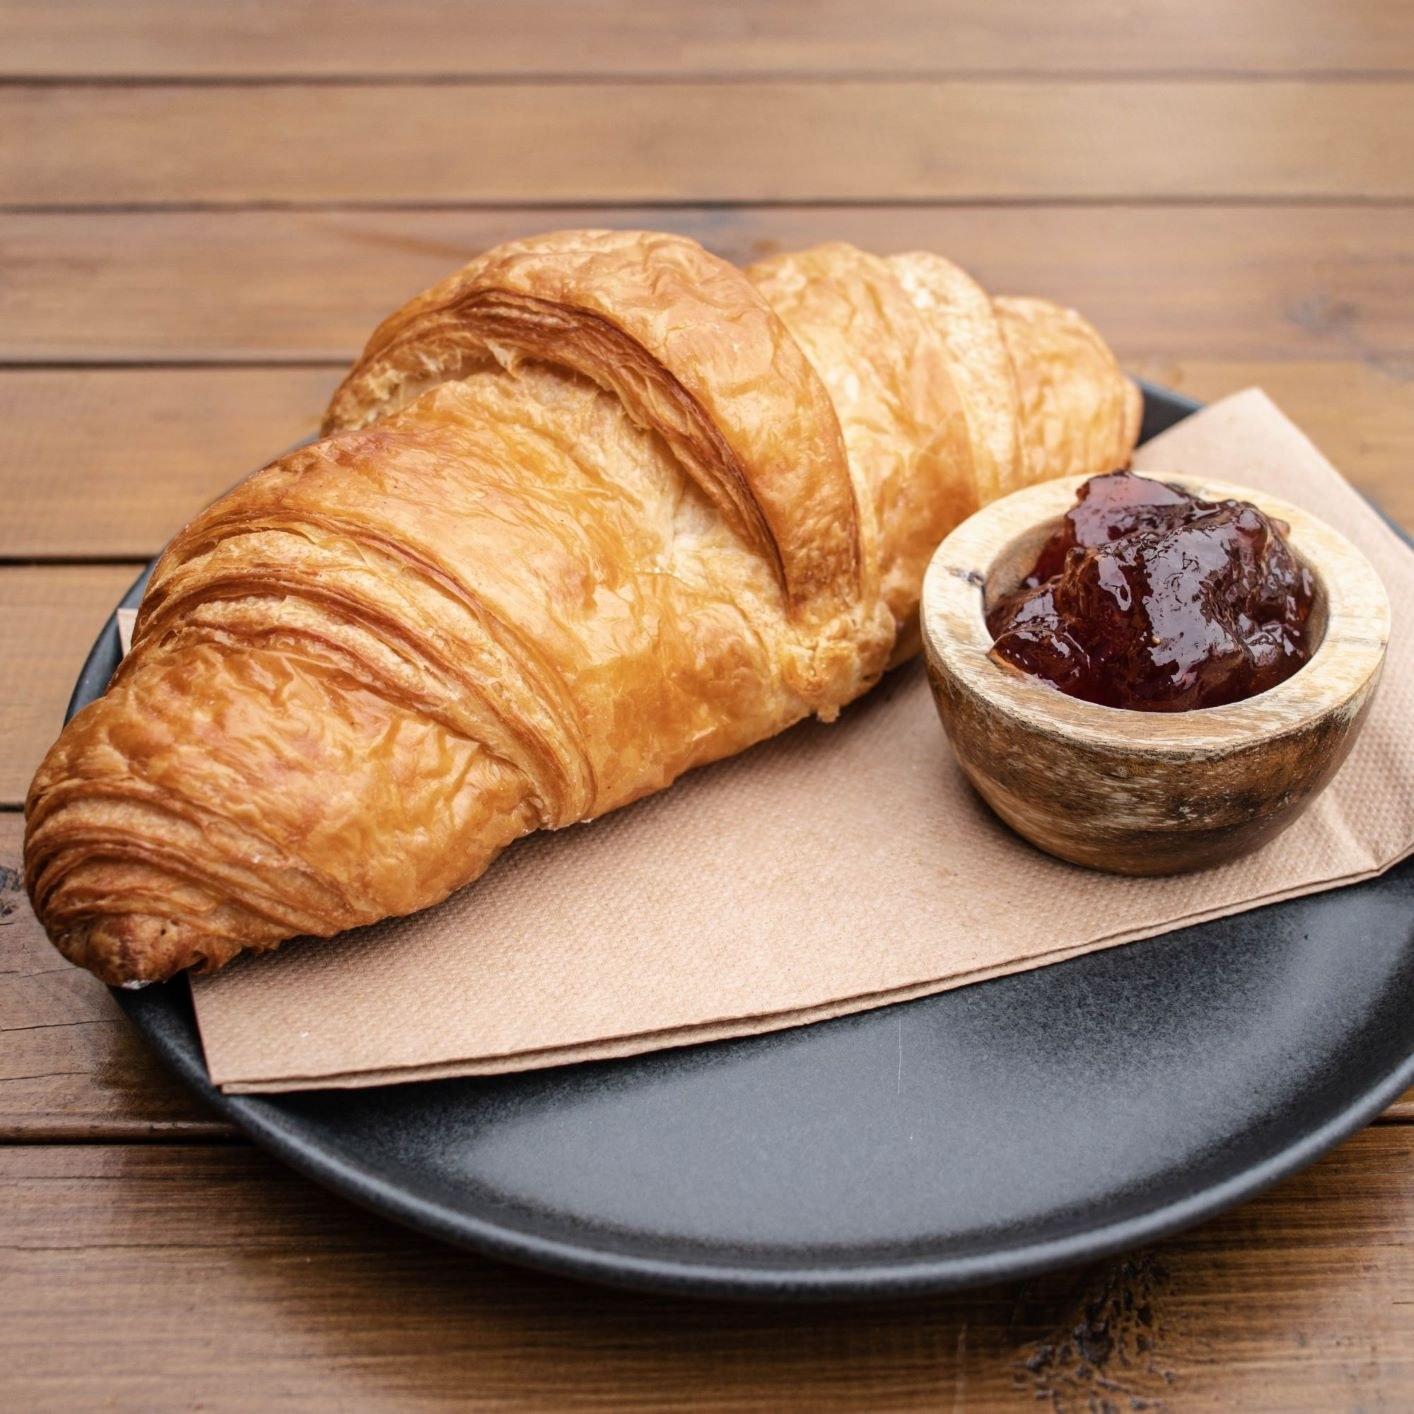 Croissant Toasted w Jam